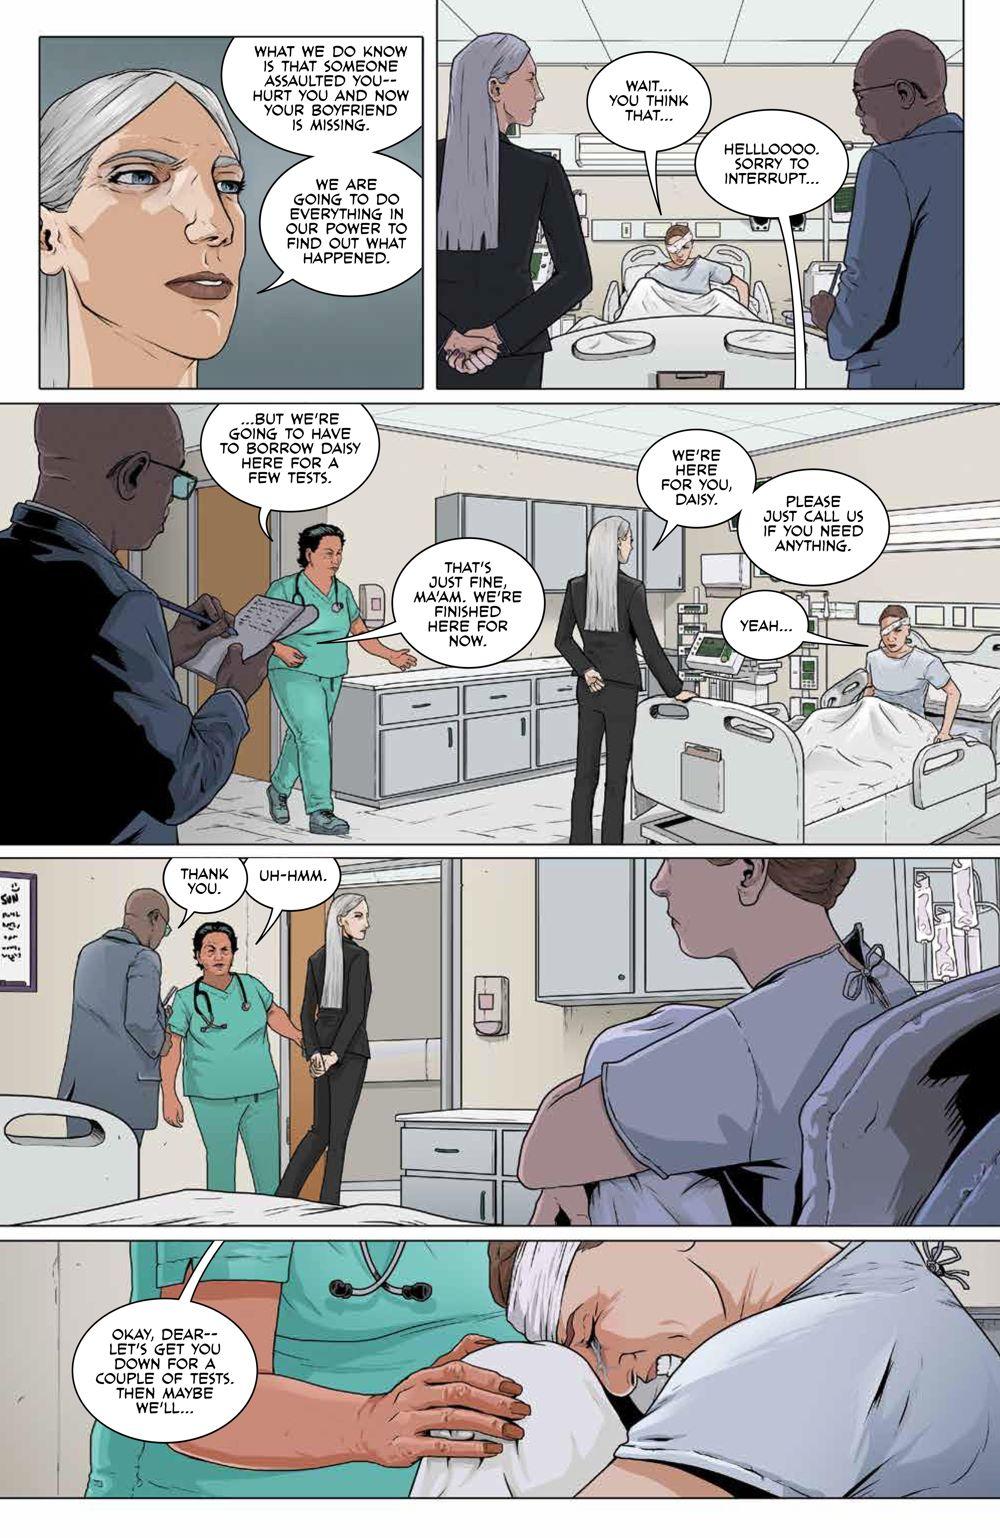 RedMother_v1_SC_PRESS_18 ComicList Previews: RED MOTHER VOLUME 1 TP